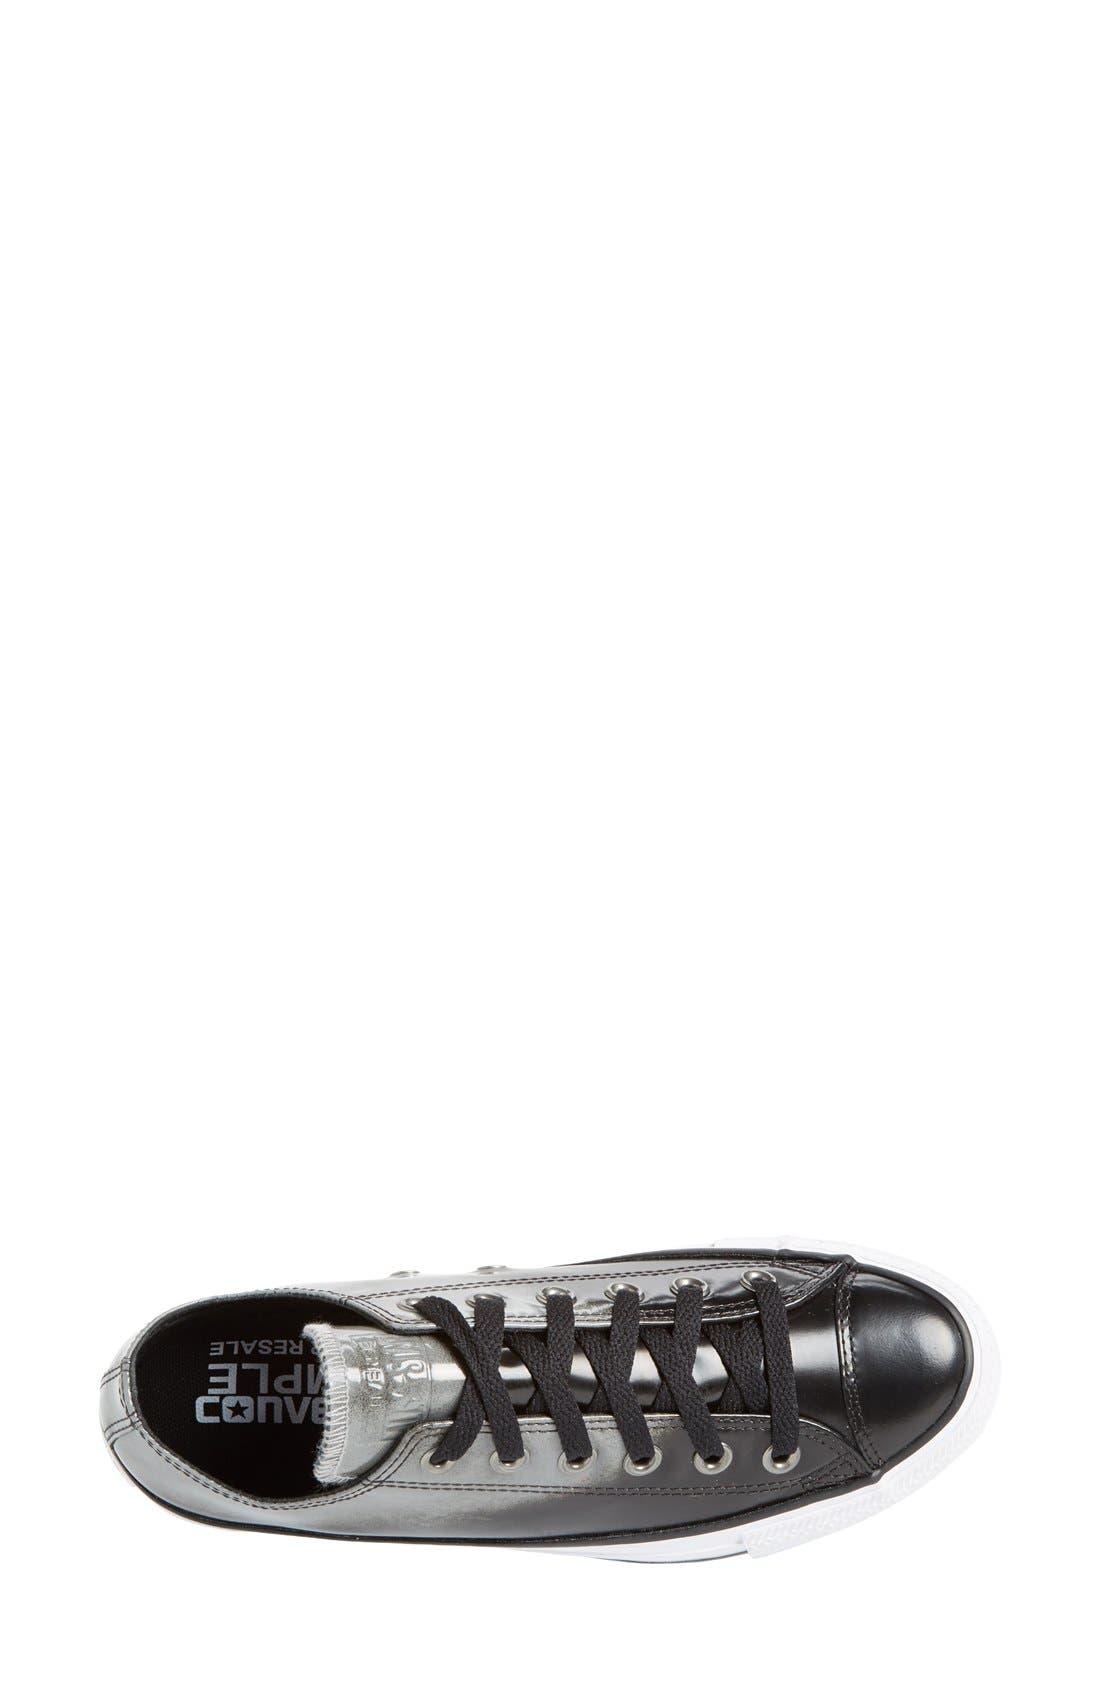 Alternate Image 3  - Converse All Star®Chuck Taylor® 'OmbréOx' Sneaker (Women)